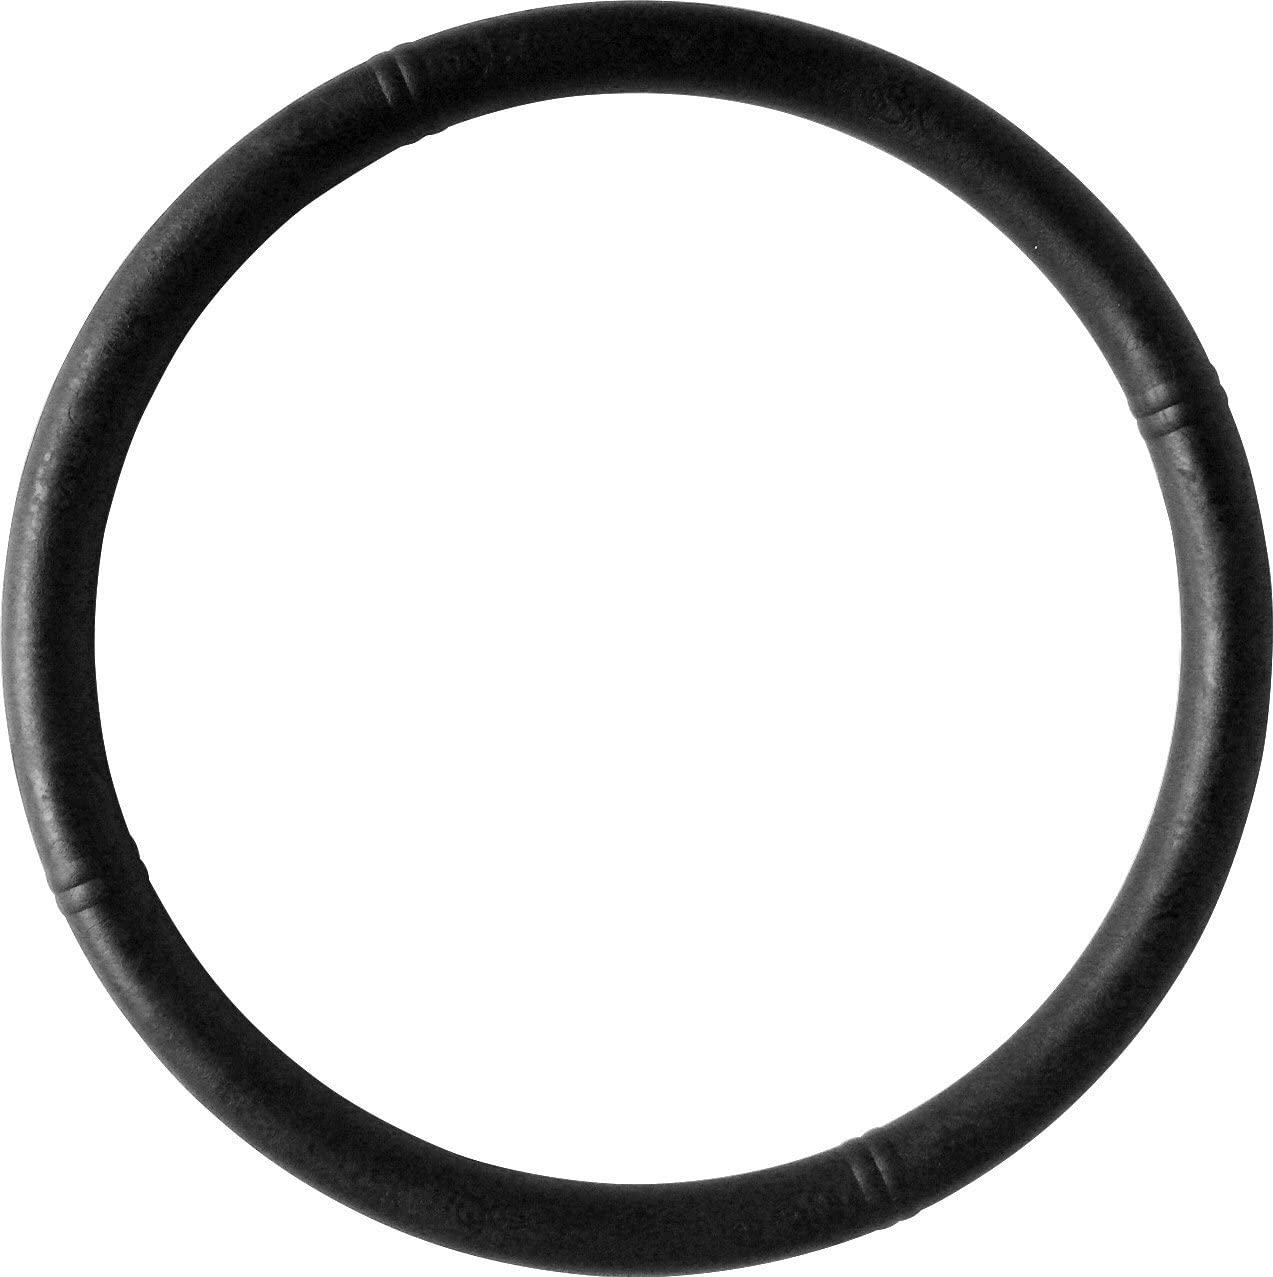 Martial Arts Black Polypropylene Plastic Full contact Wing Chun training Ring - 13